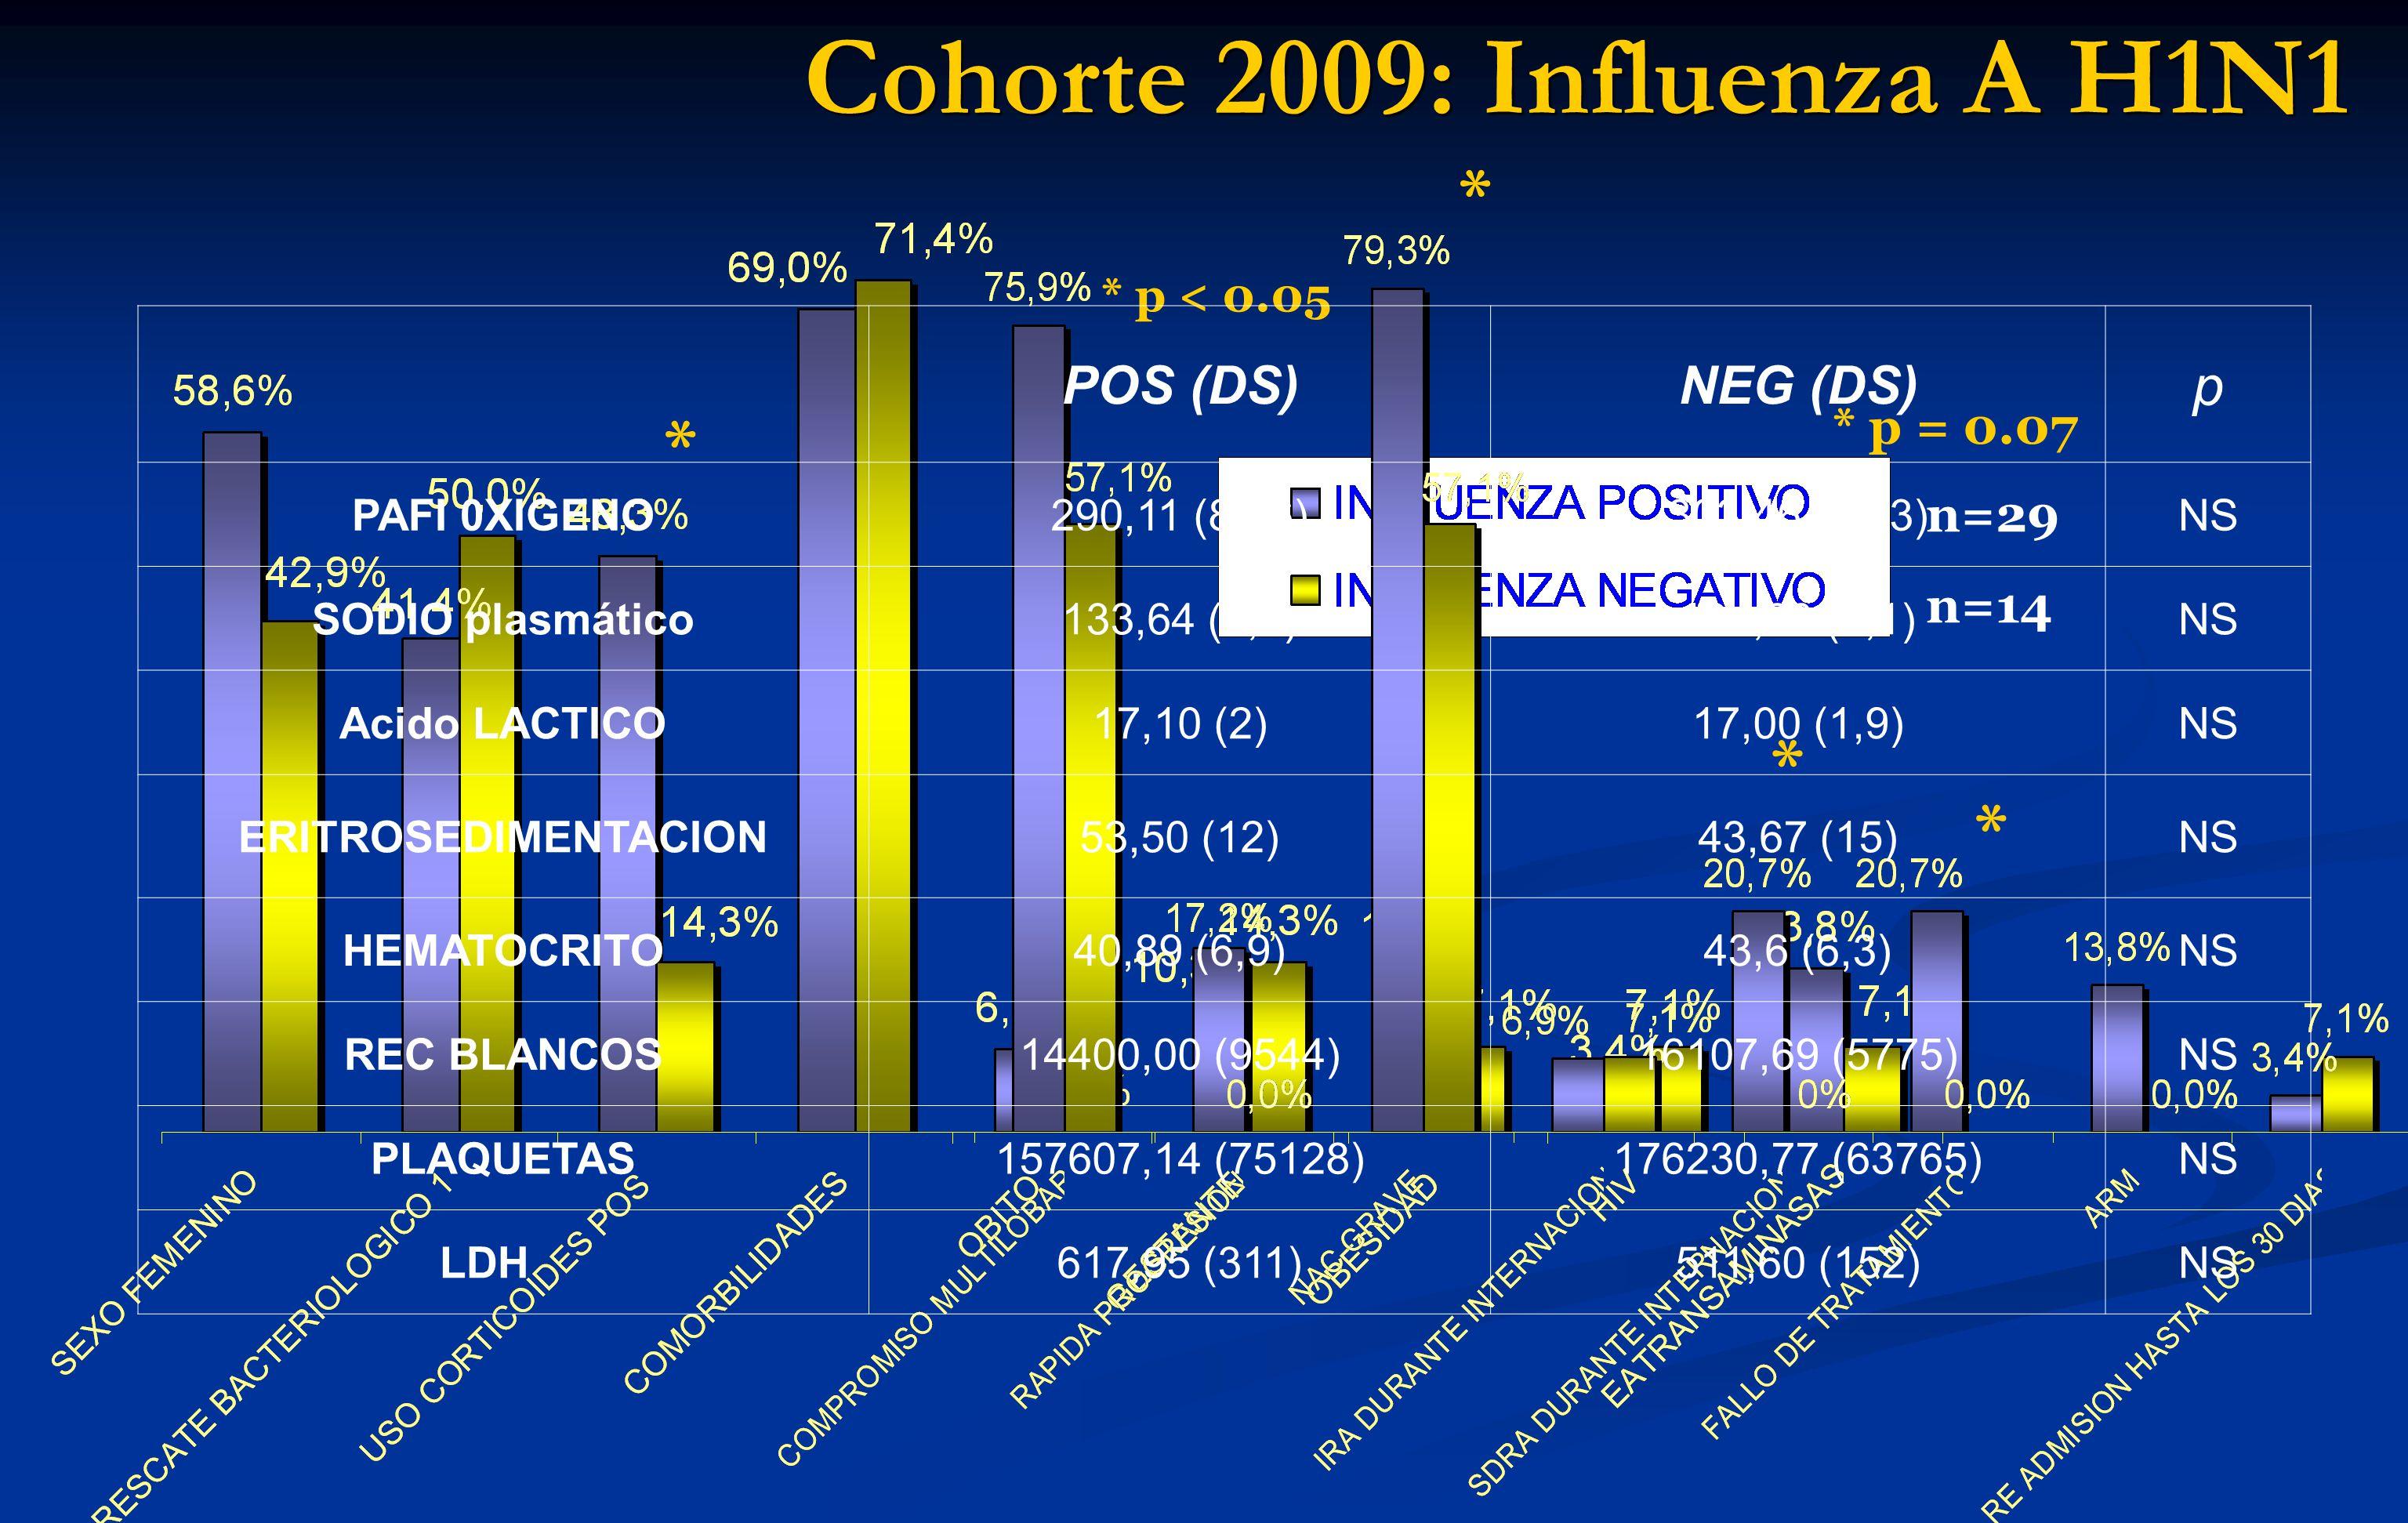 Cohorte 2009: Influenza A H1N1